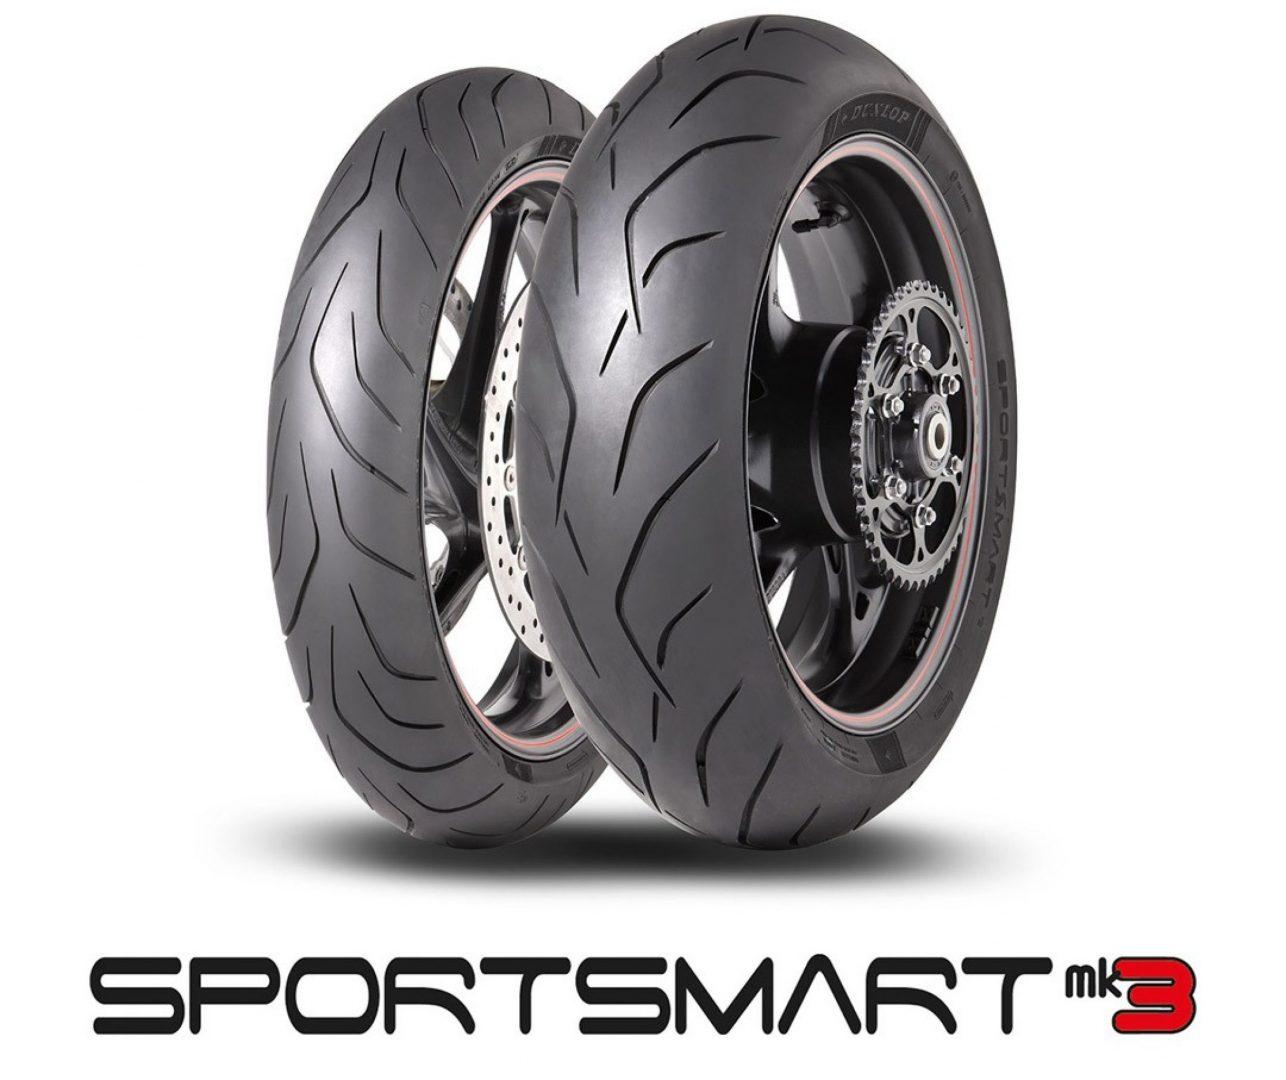 Dunlop SportSmart MK3 : le nouveau pneu hypersport